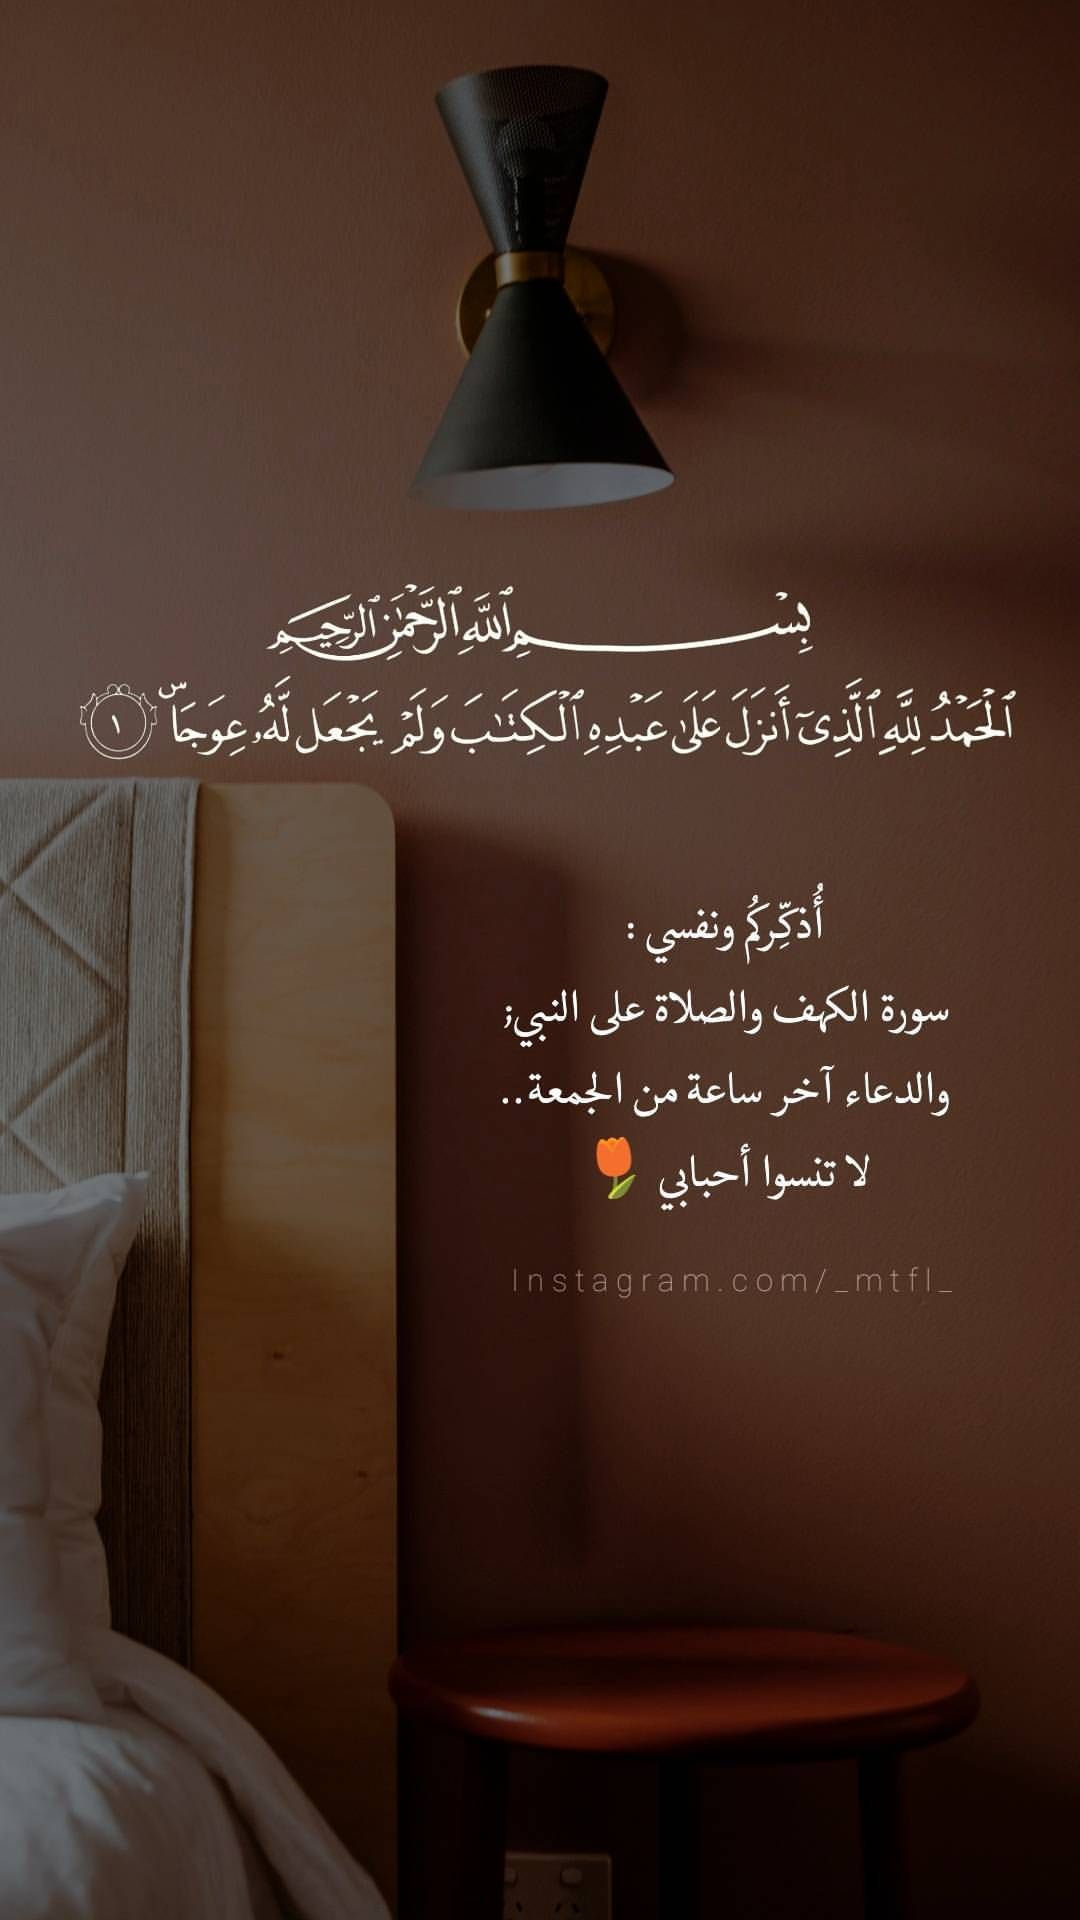 Pin By Dua A Abu Alezz On Birthday Islamic Quotes Quran Quran Quotes Love Quran Quotes Inspirational